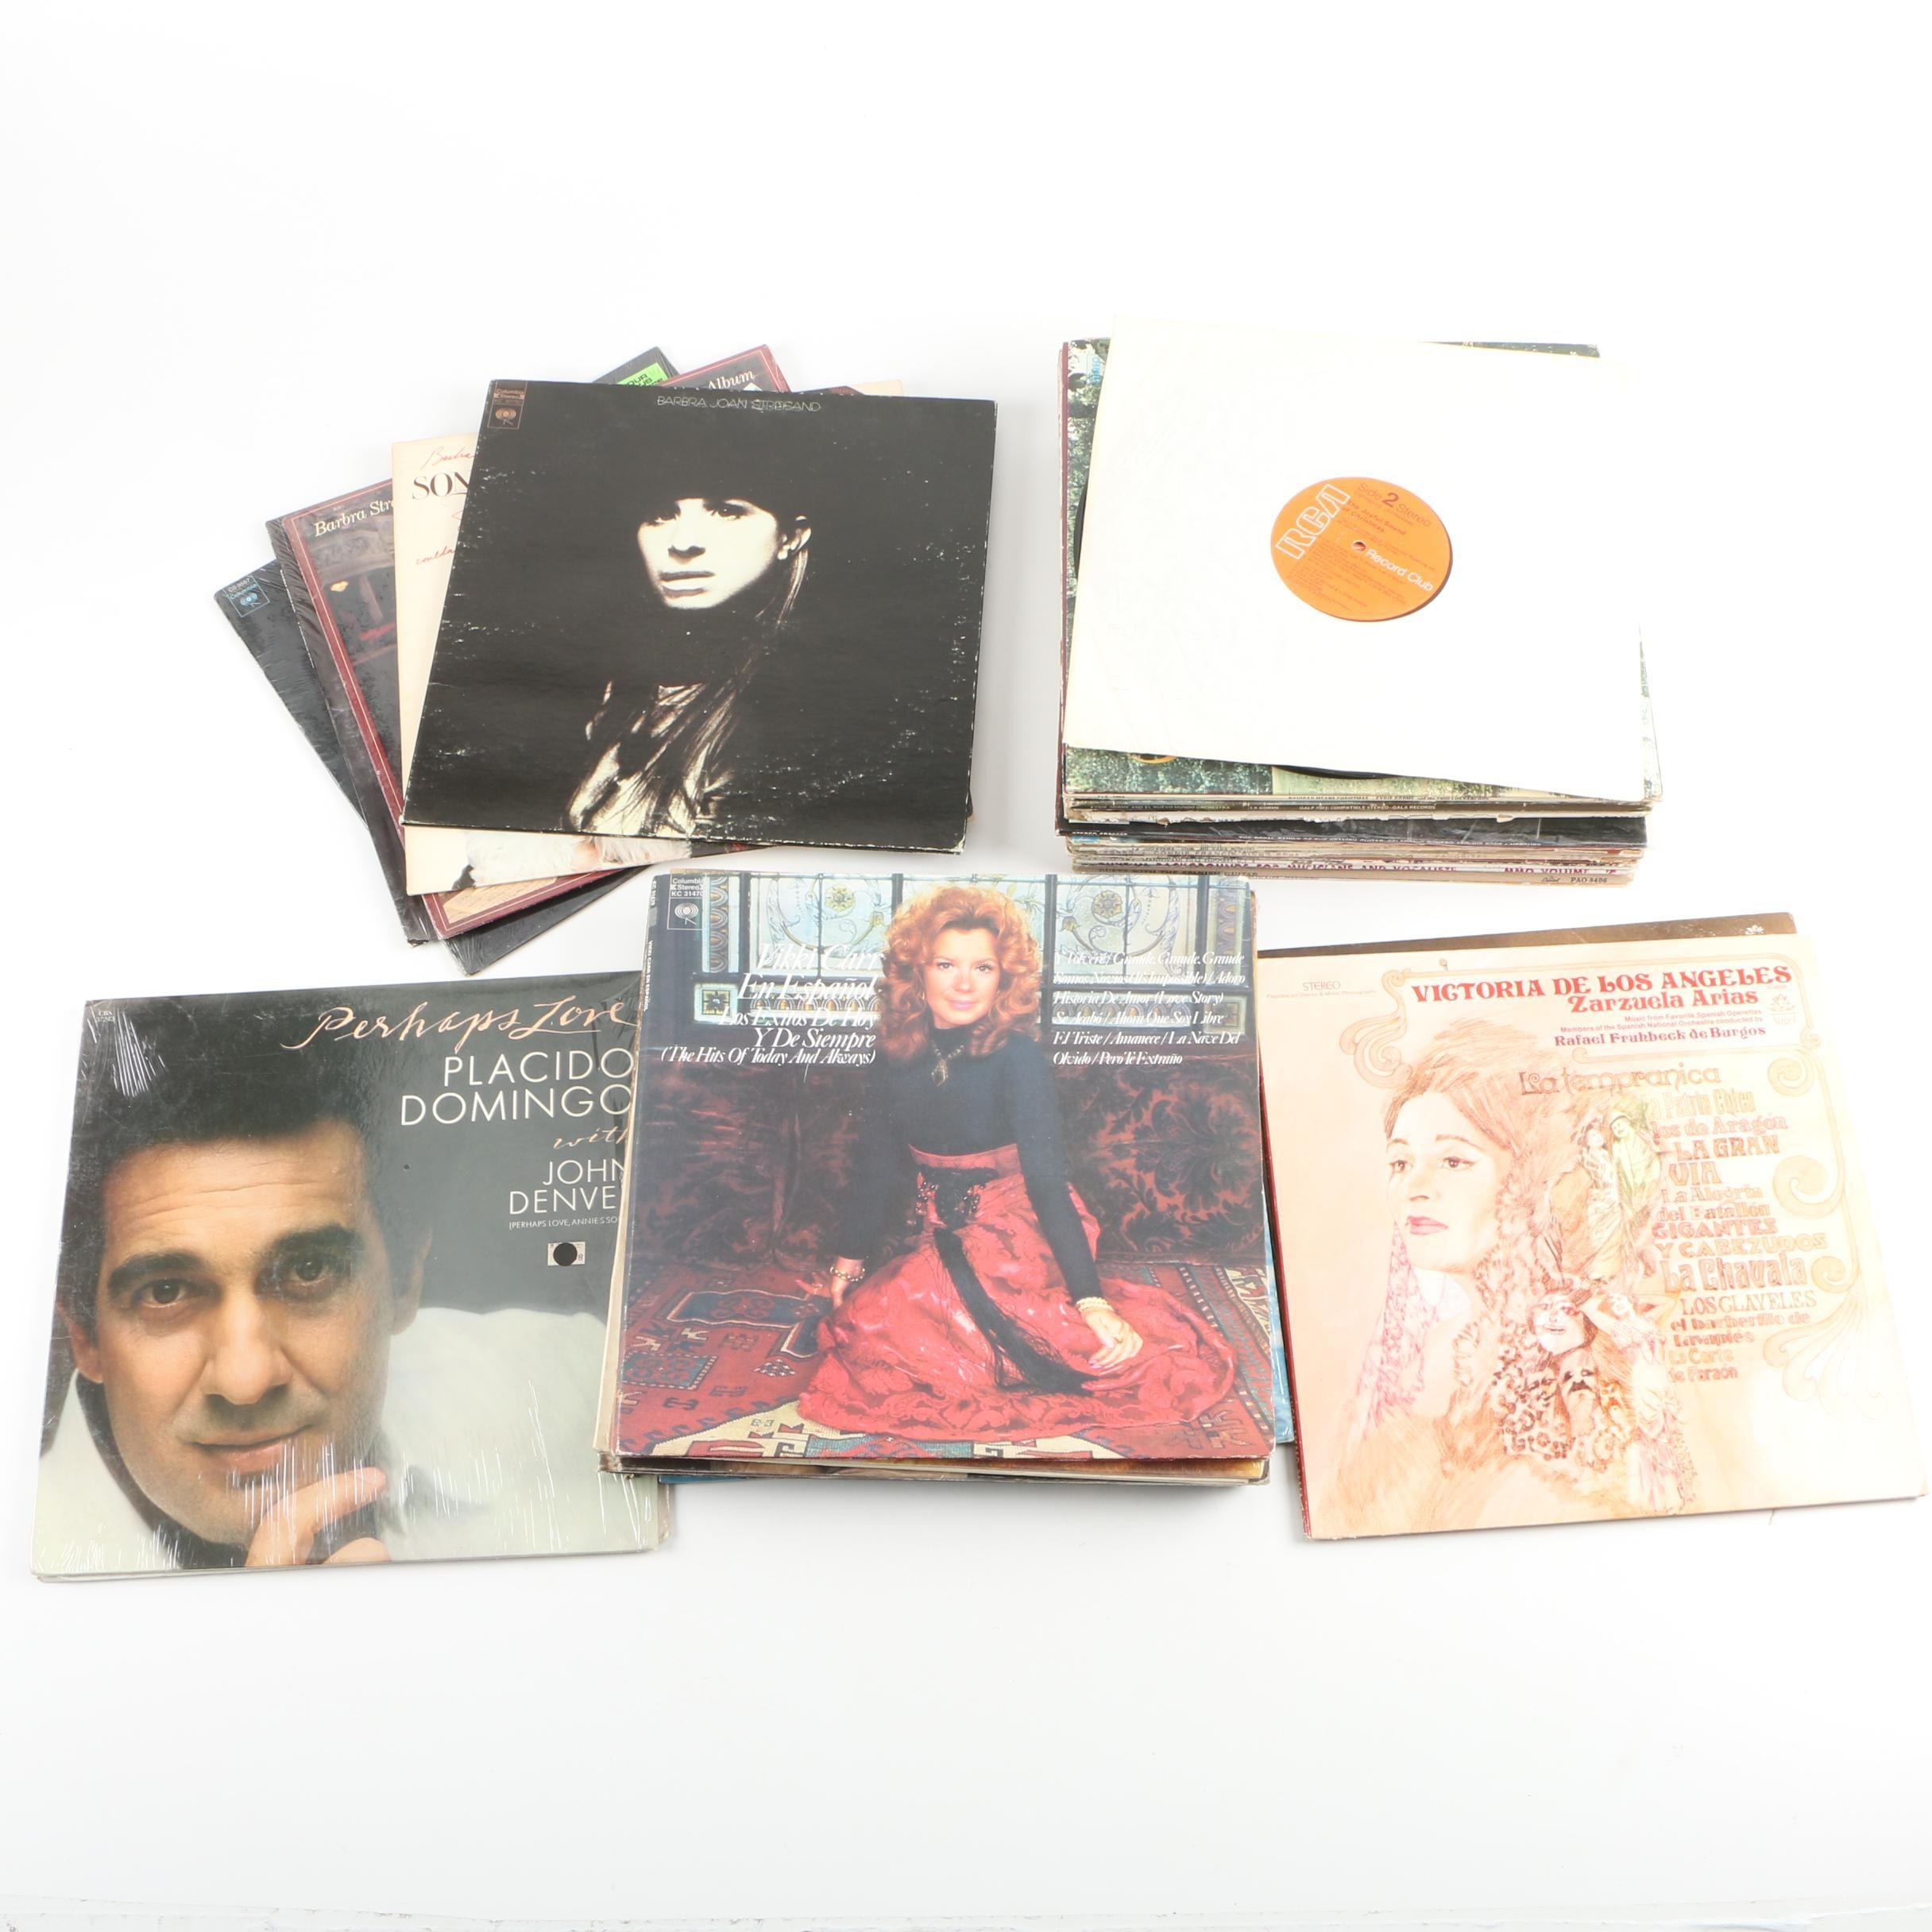 Vikki Carr, Barbara Streisand, Plácido Domingo and Other Records